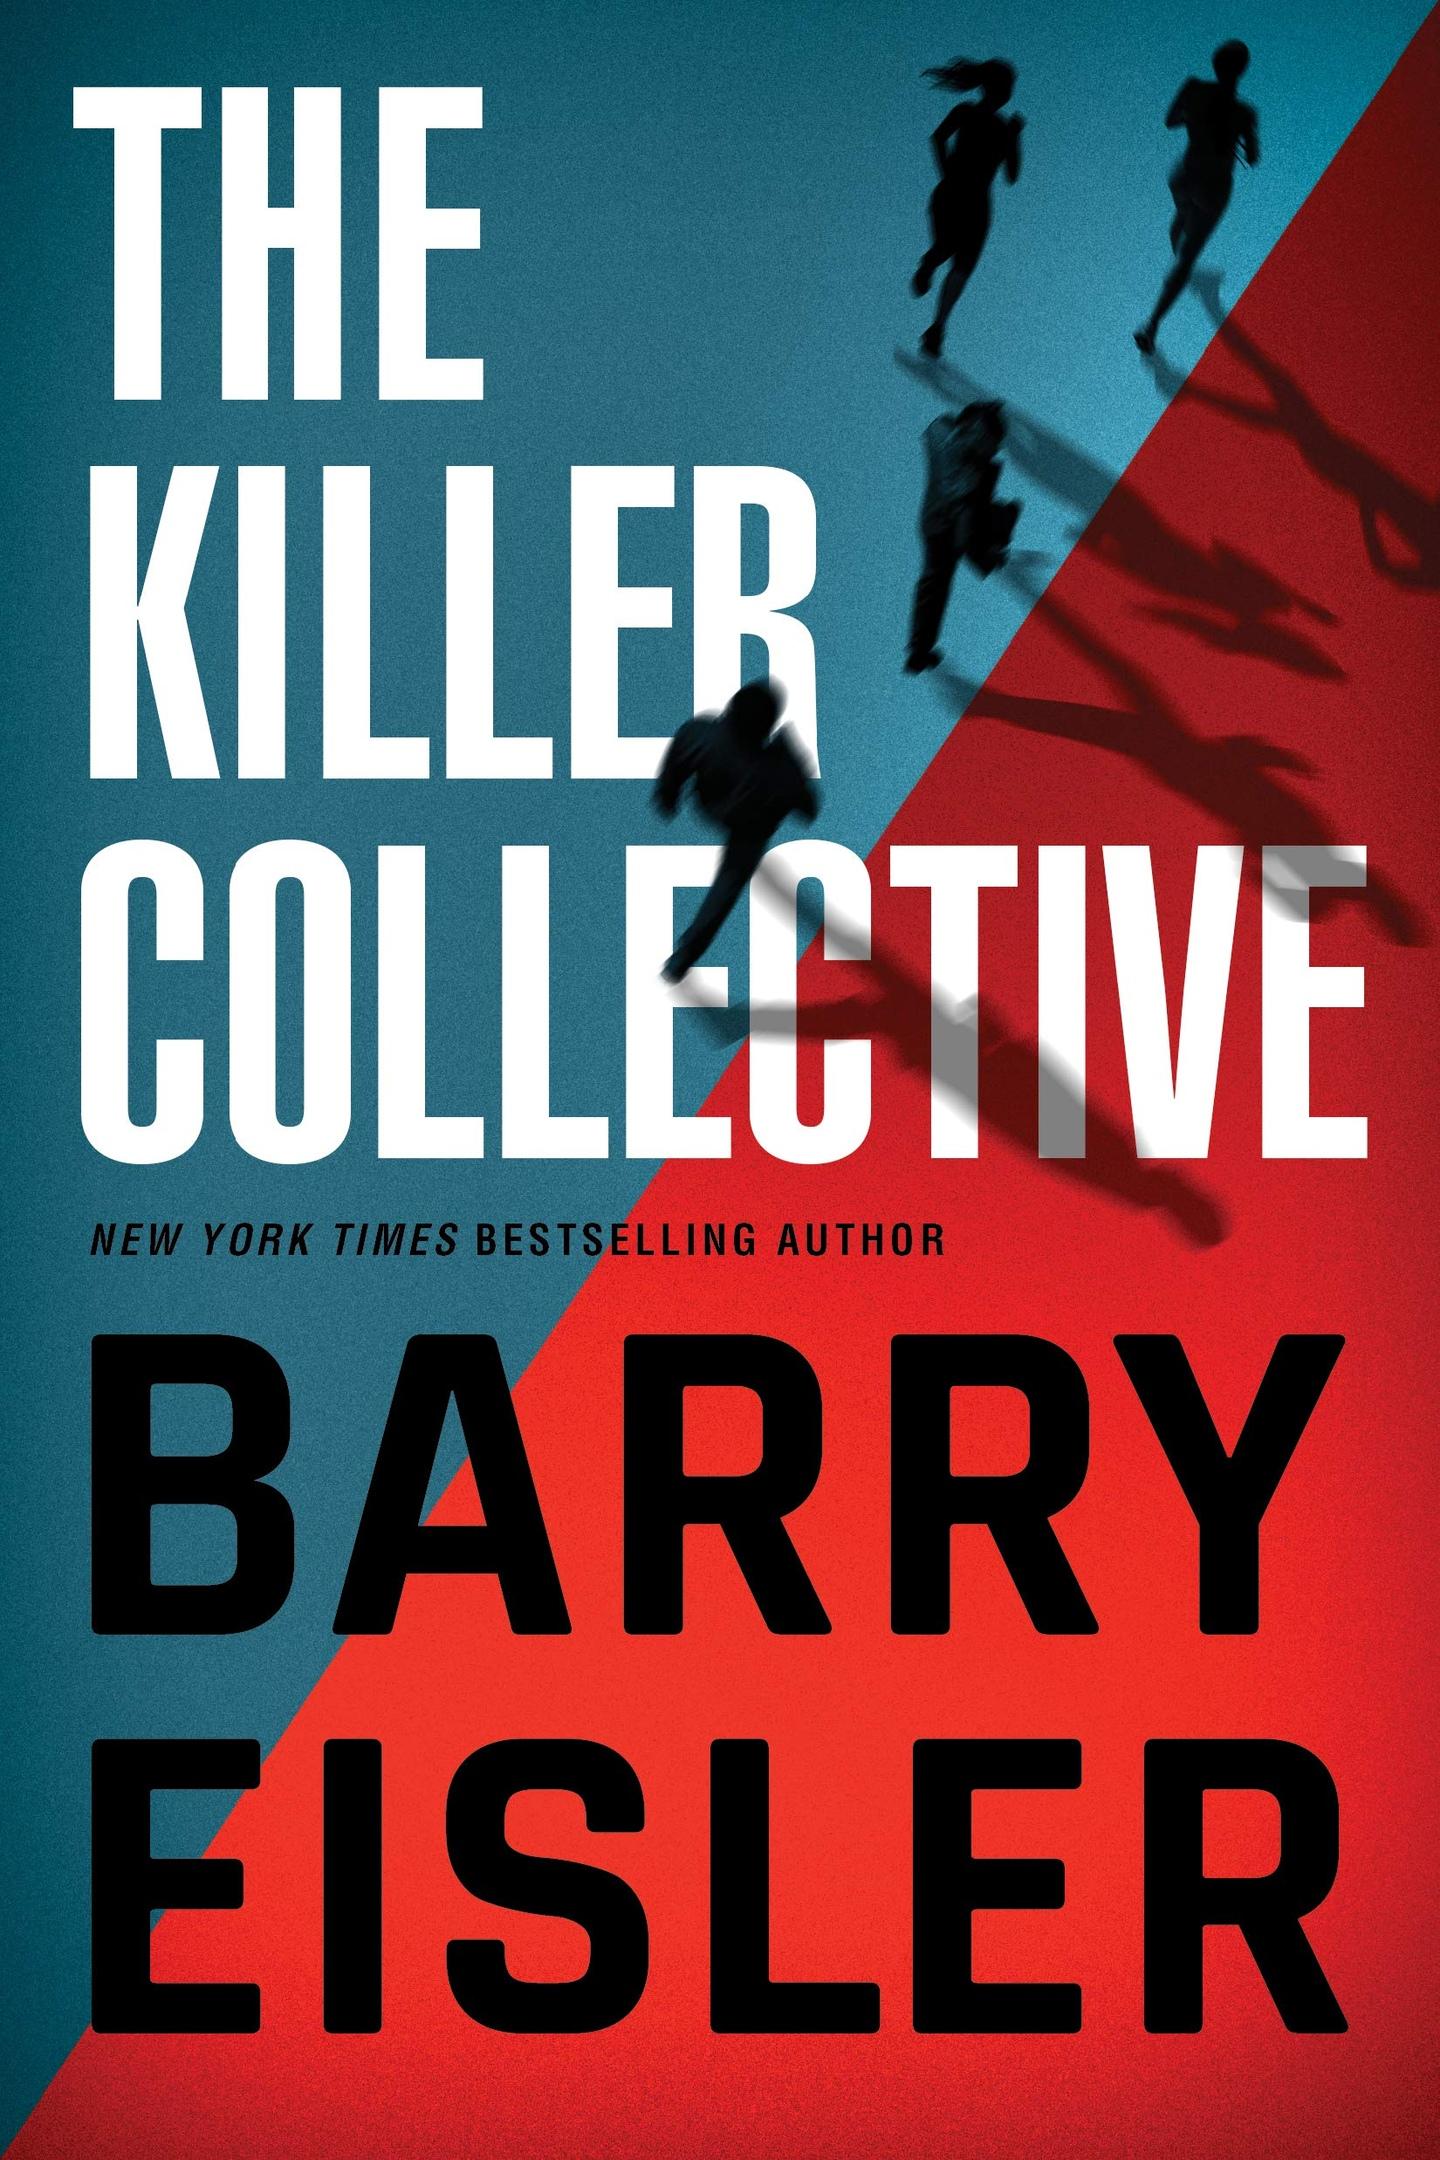 Barry Eisler – The Killer Collective